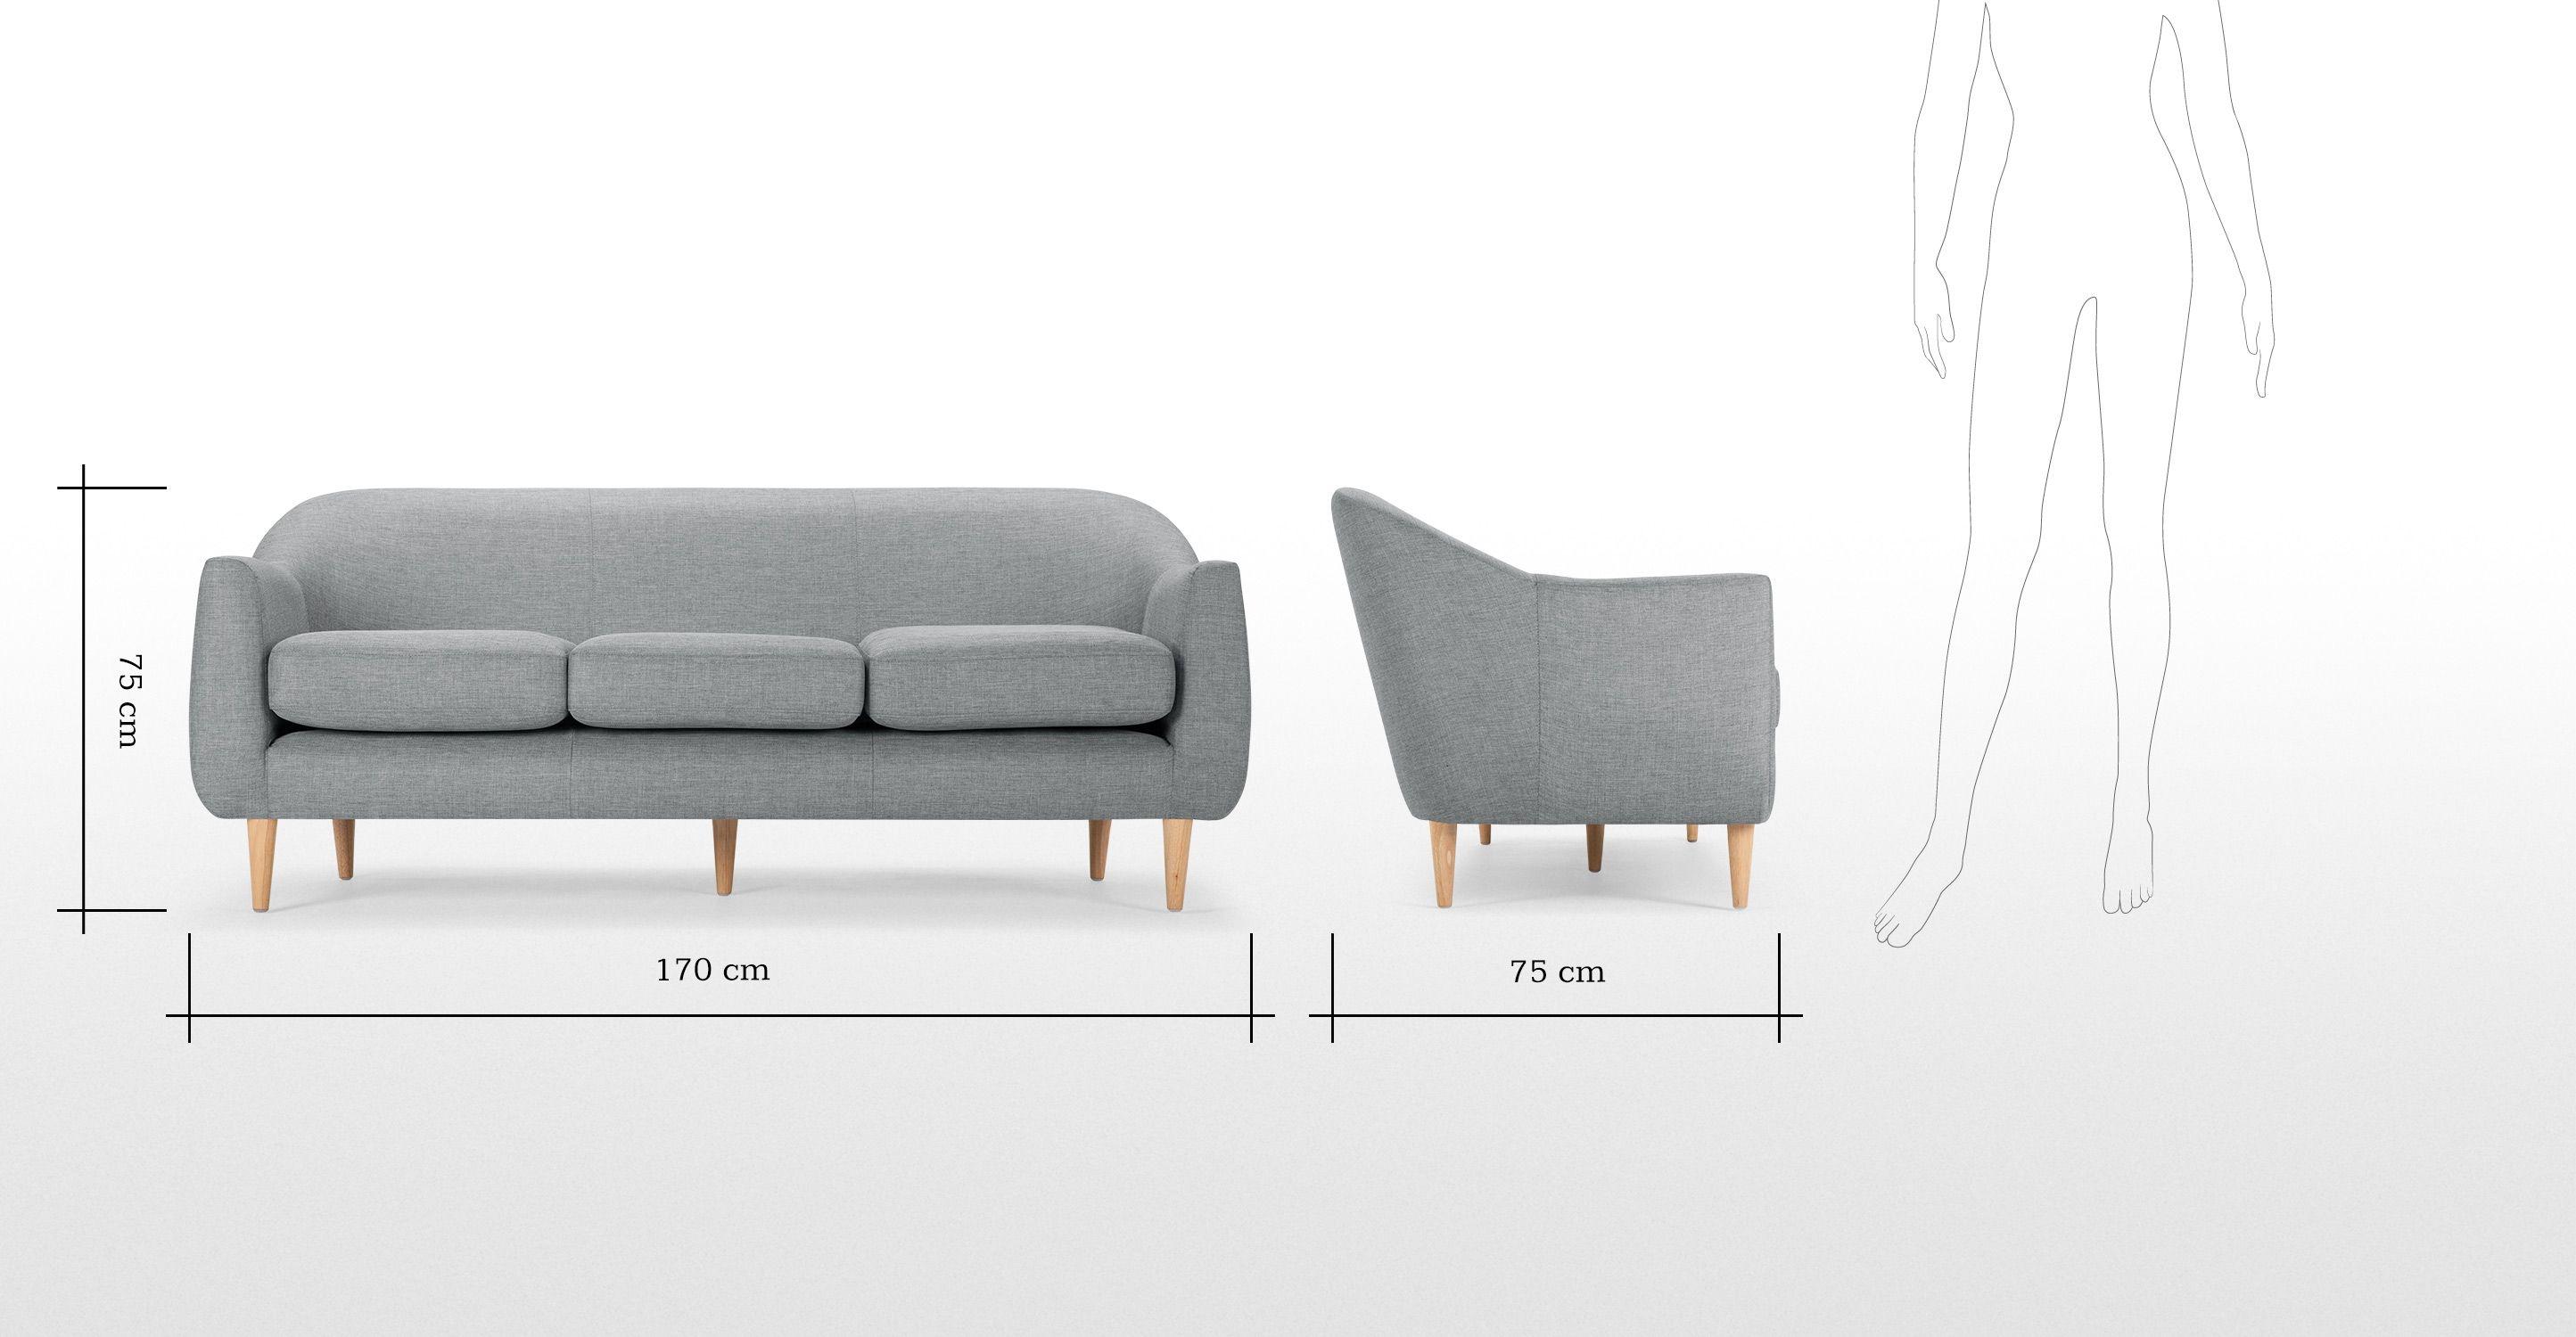 Sita Sofa Bankstellen.Tubby 3 Seater Sofa Koala Grey Made Com New House 2019